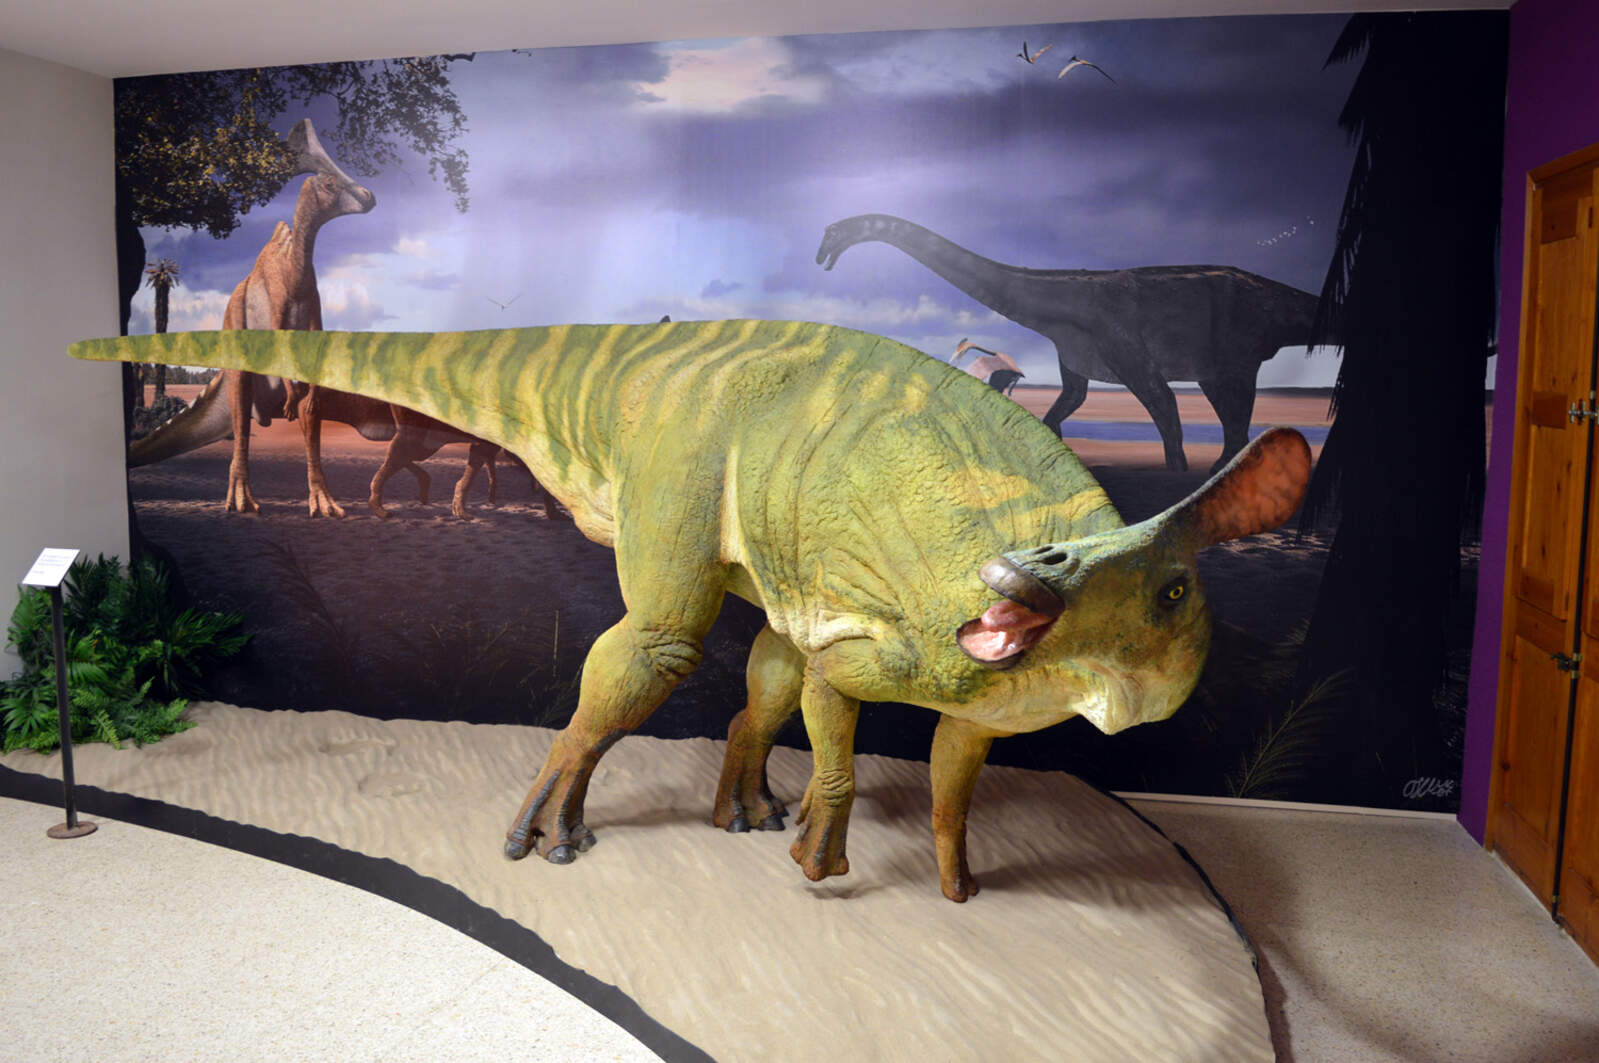 Recreació escultòrica de l'aspecte en vida de Pararhabdodon isonensis al Museu de la Conca Dellà